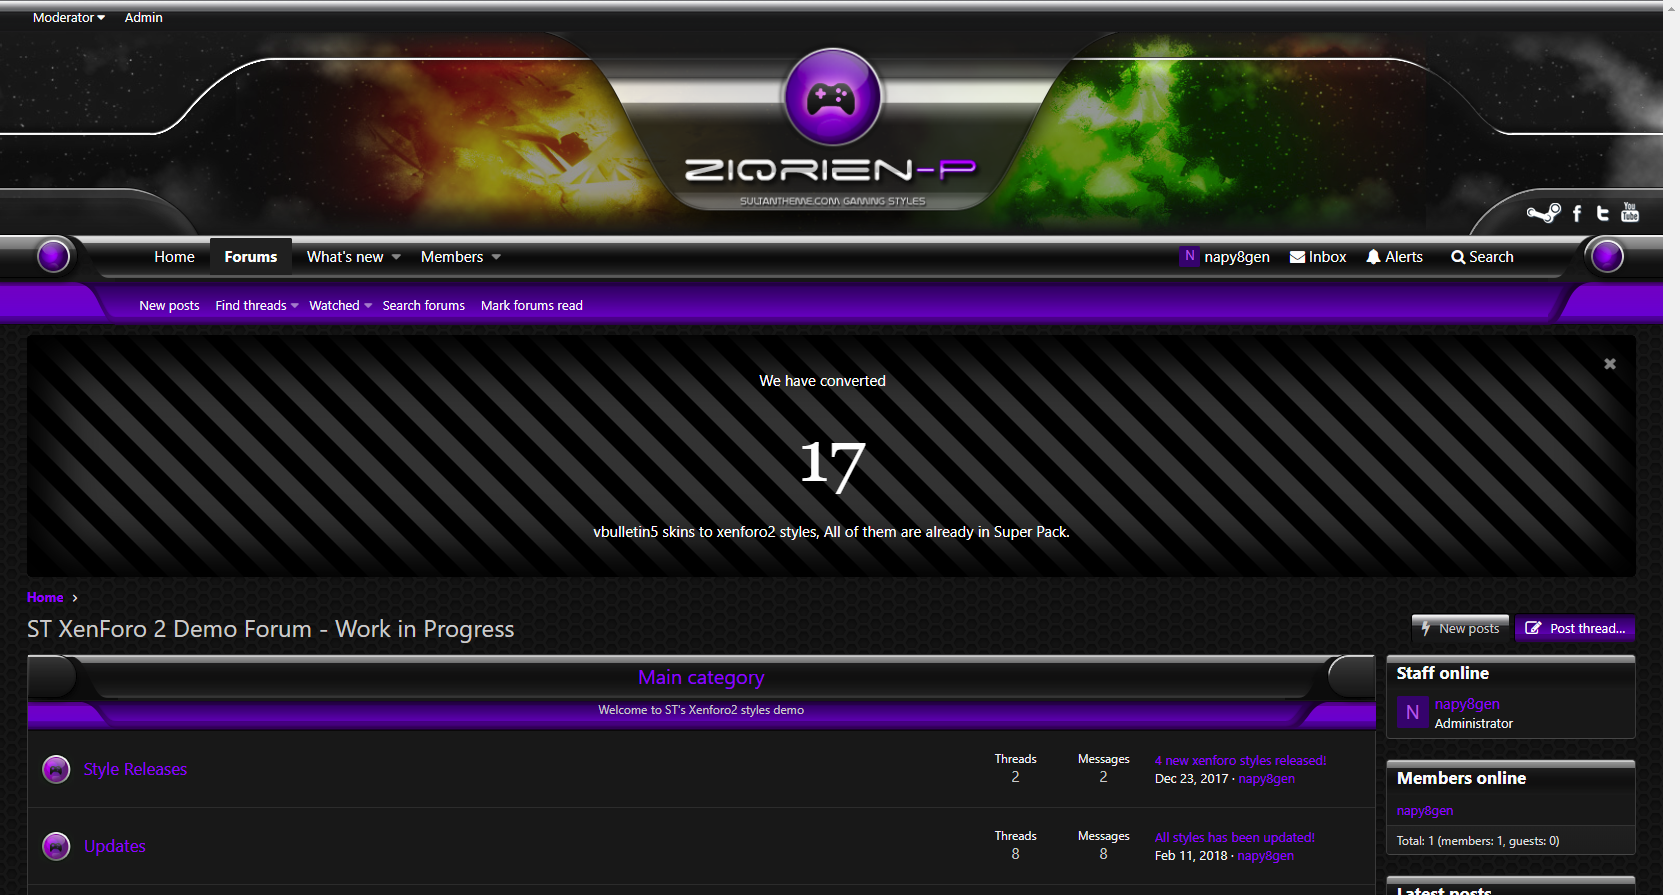 ziqrien p 2 - 7 new xenforo2 styles released!